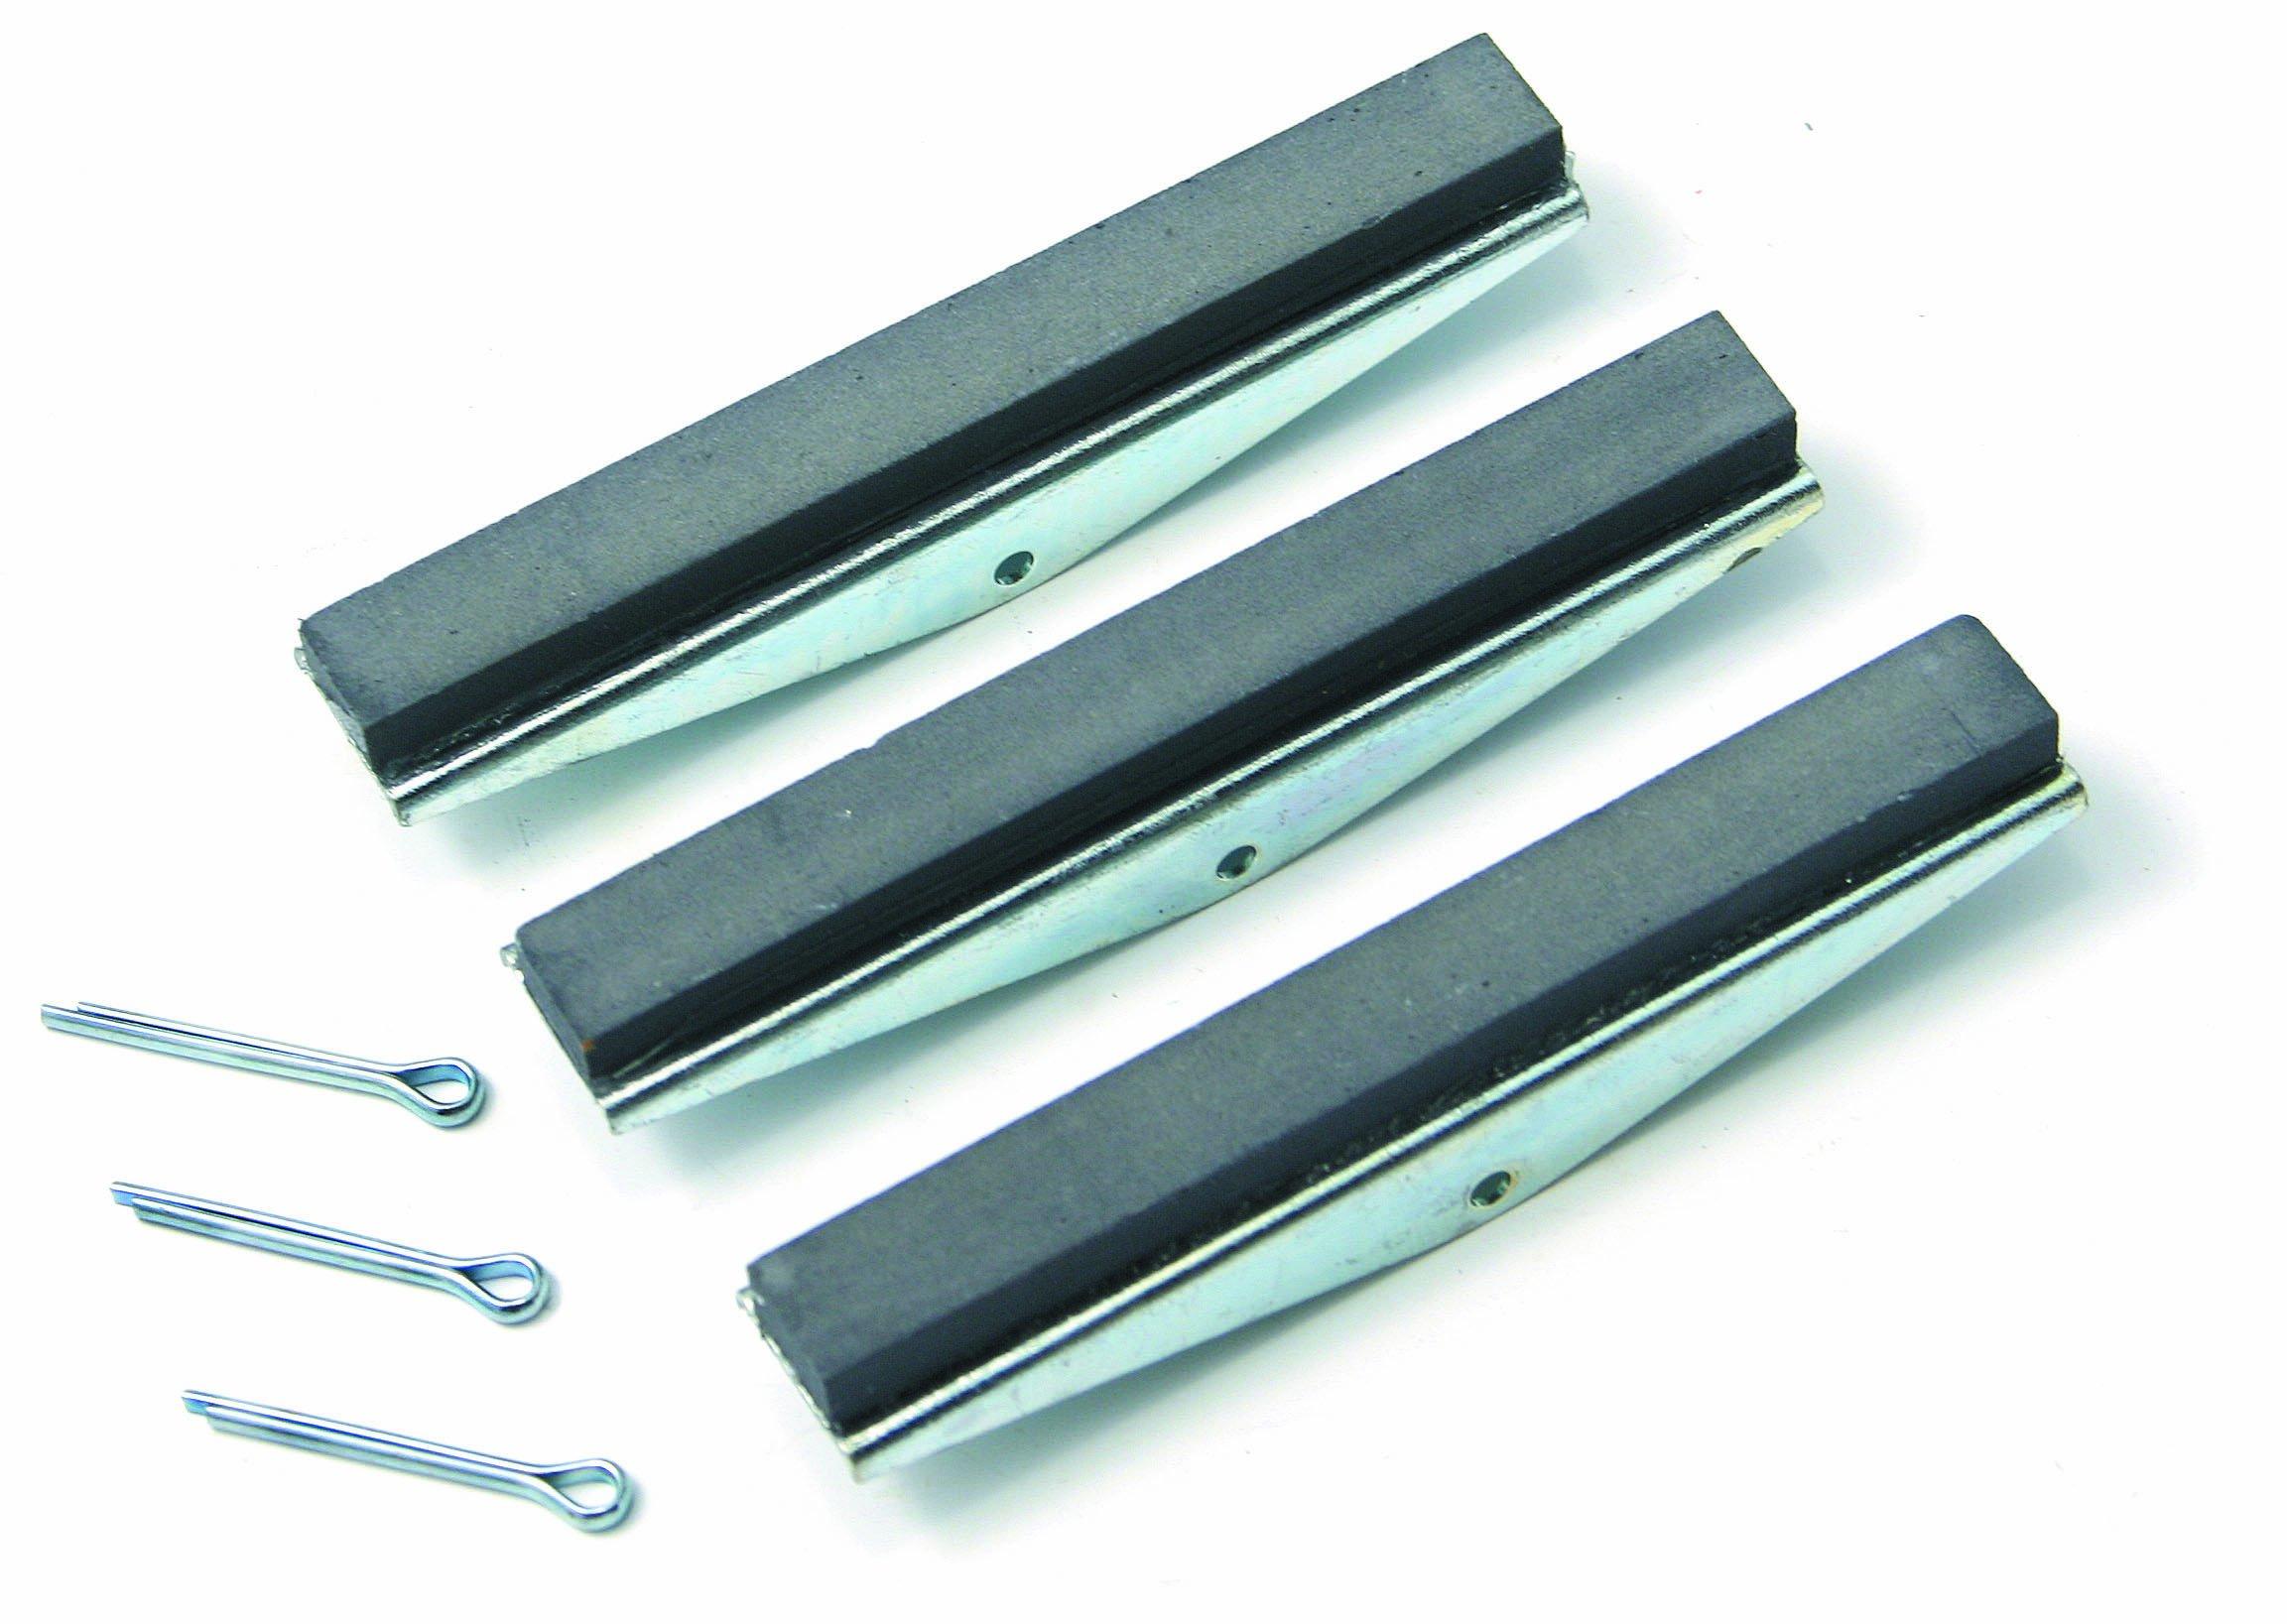 CTA Tools 2318 Engine Hone Replacement Stones for CTA Models 2325 and 2310 - Medium